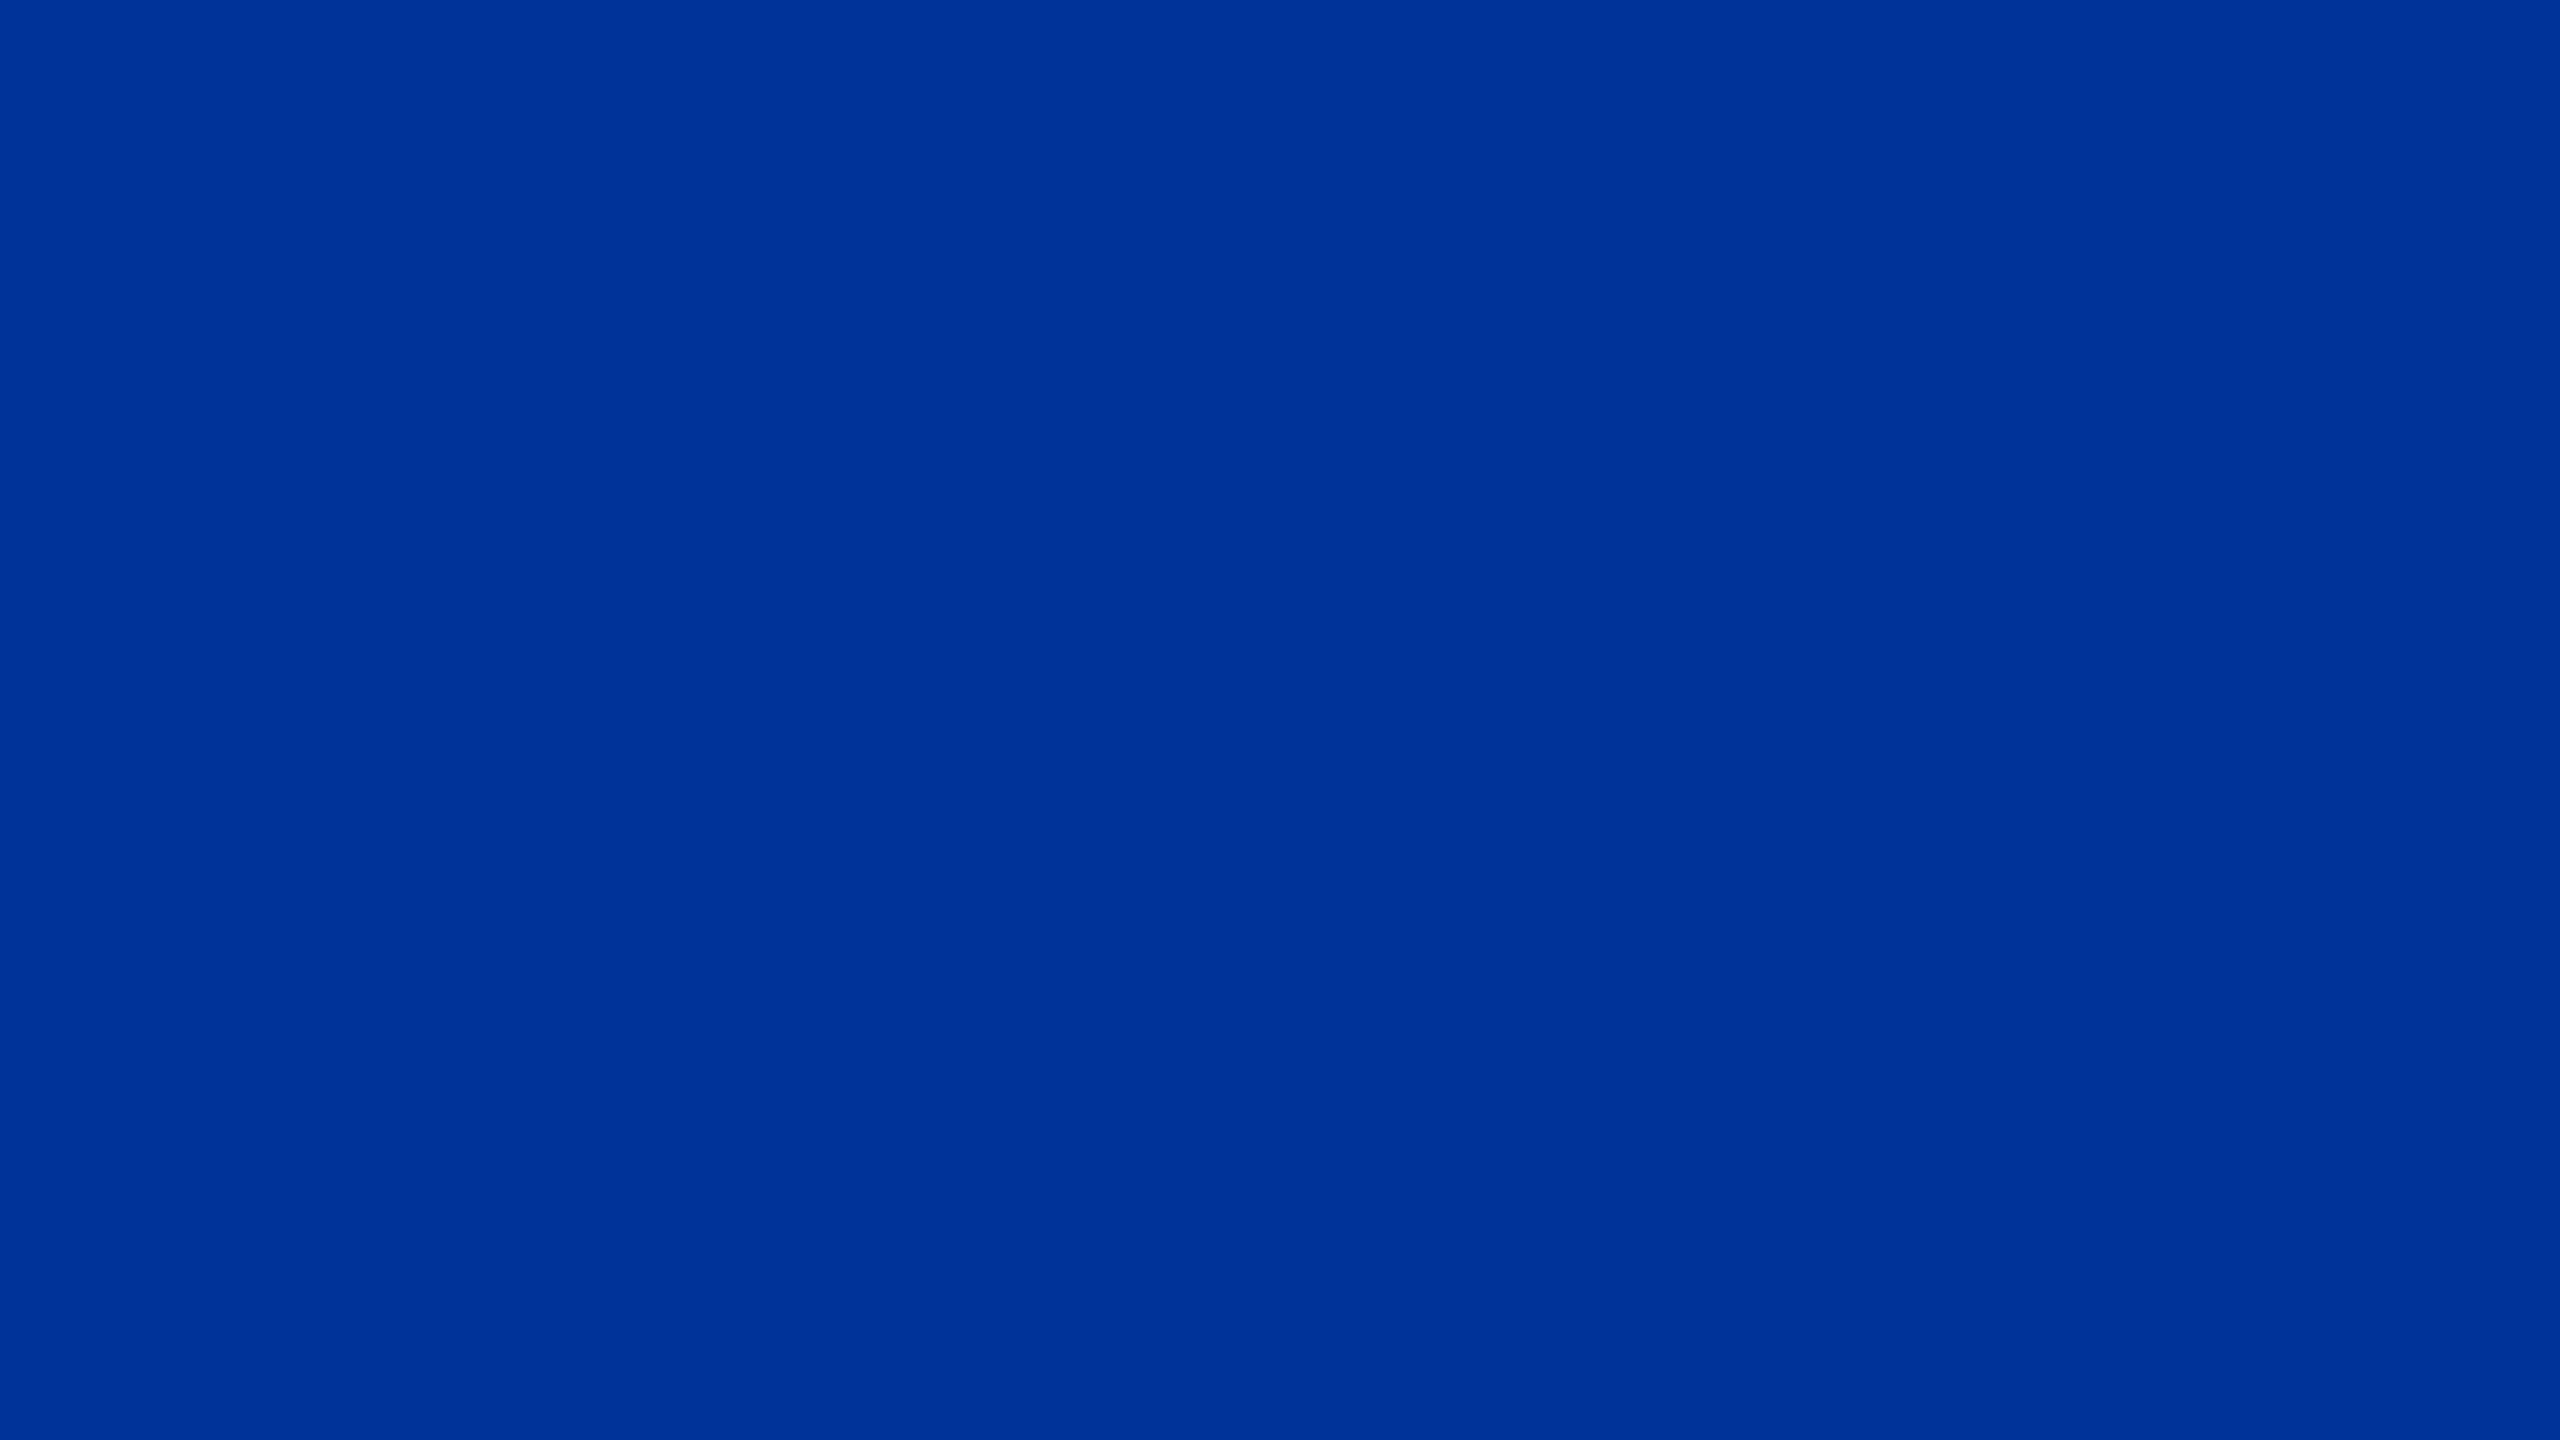 2560x1440 Smalt Dark Powder Blue Solid Color Background